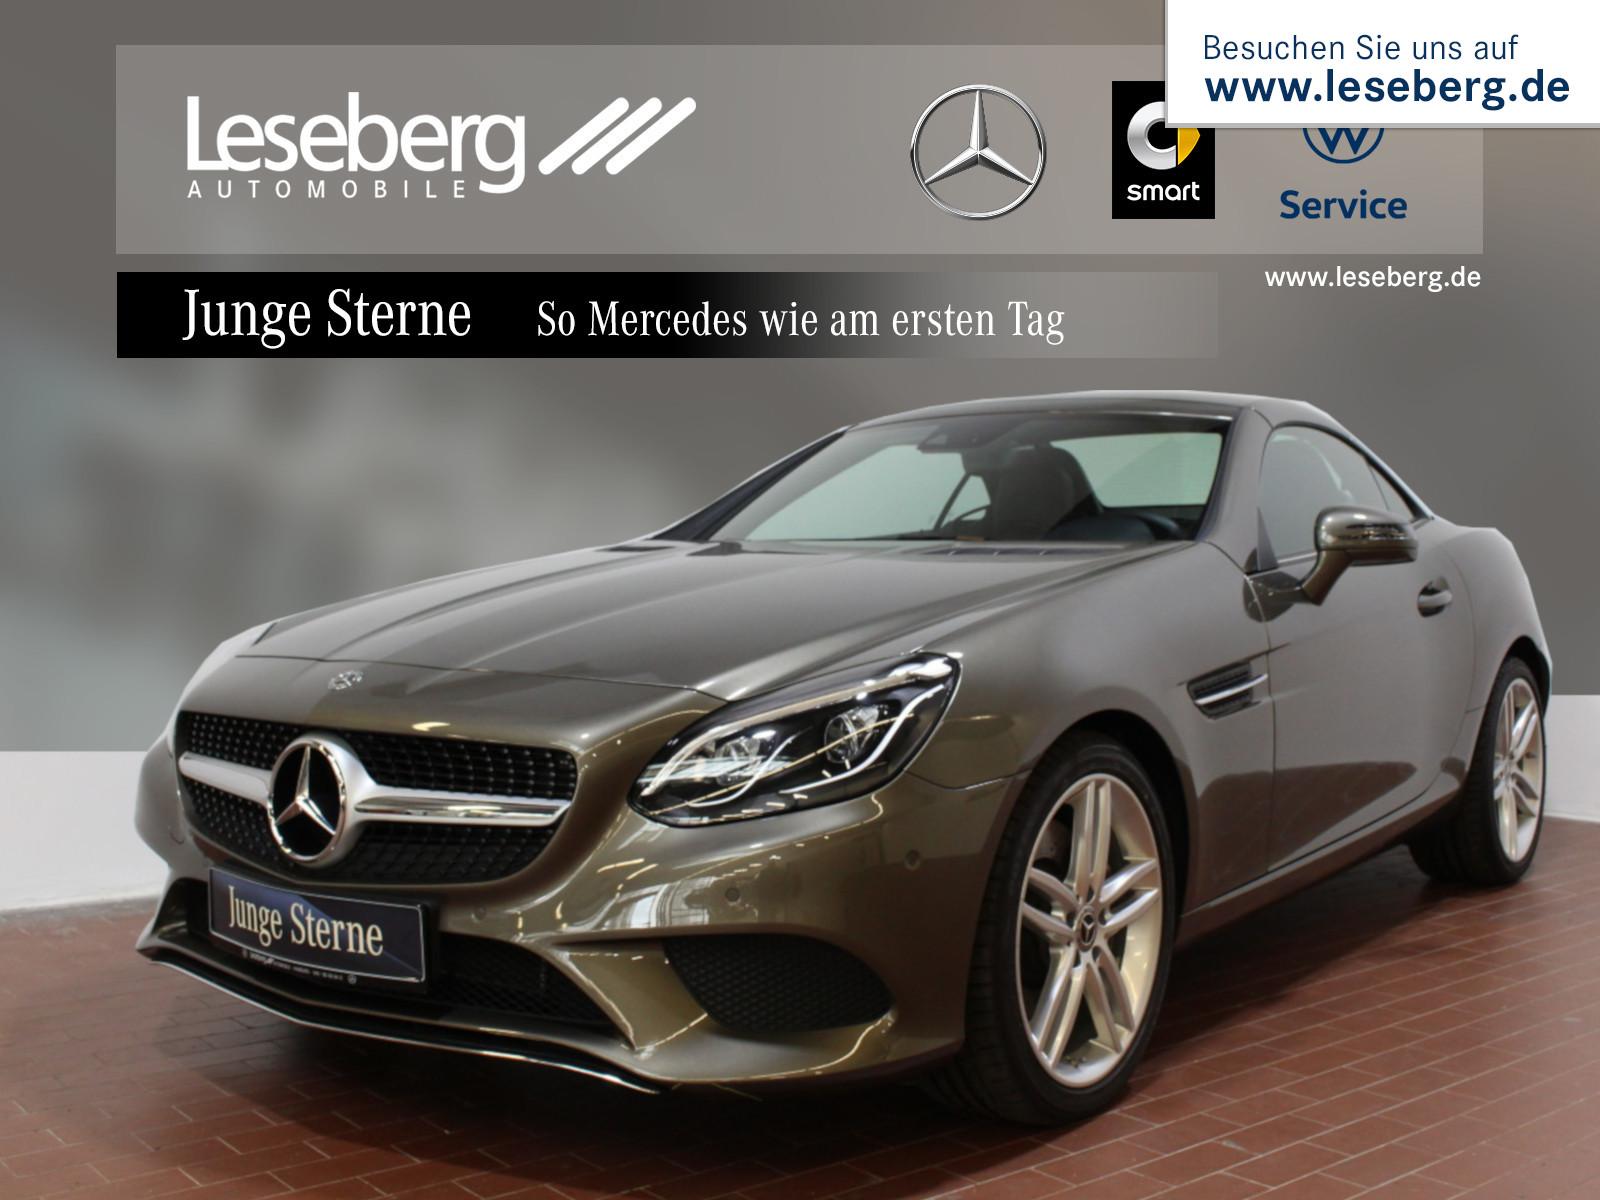 Mercedes-Benz SLC 200 Sport-Paket/LED/PTS/Navi/Totw/Airscarf, Jahr 2018, petrol